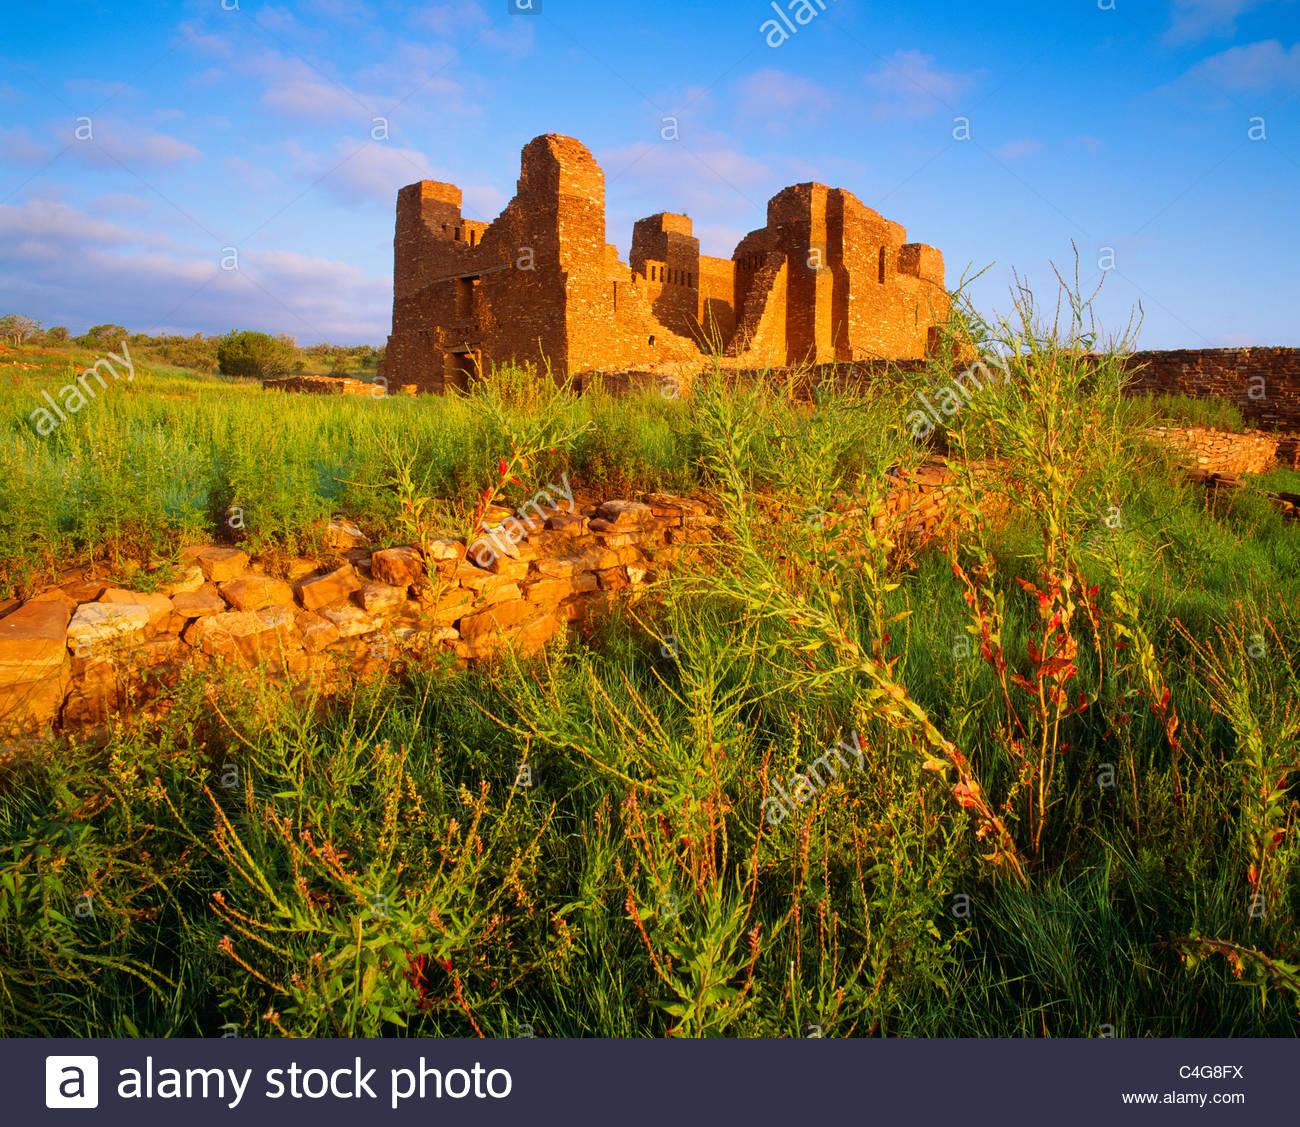 Church ruins at Quarai, [Salinas Pueblo Missions National Monument] 'New Mexico' - Stock Image